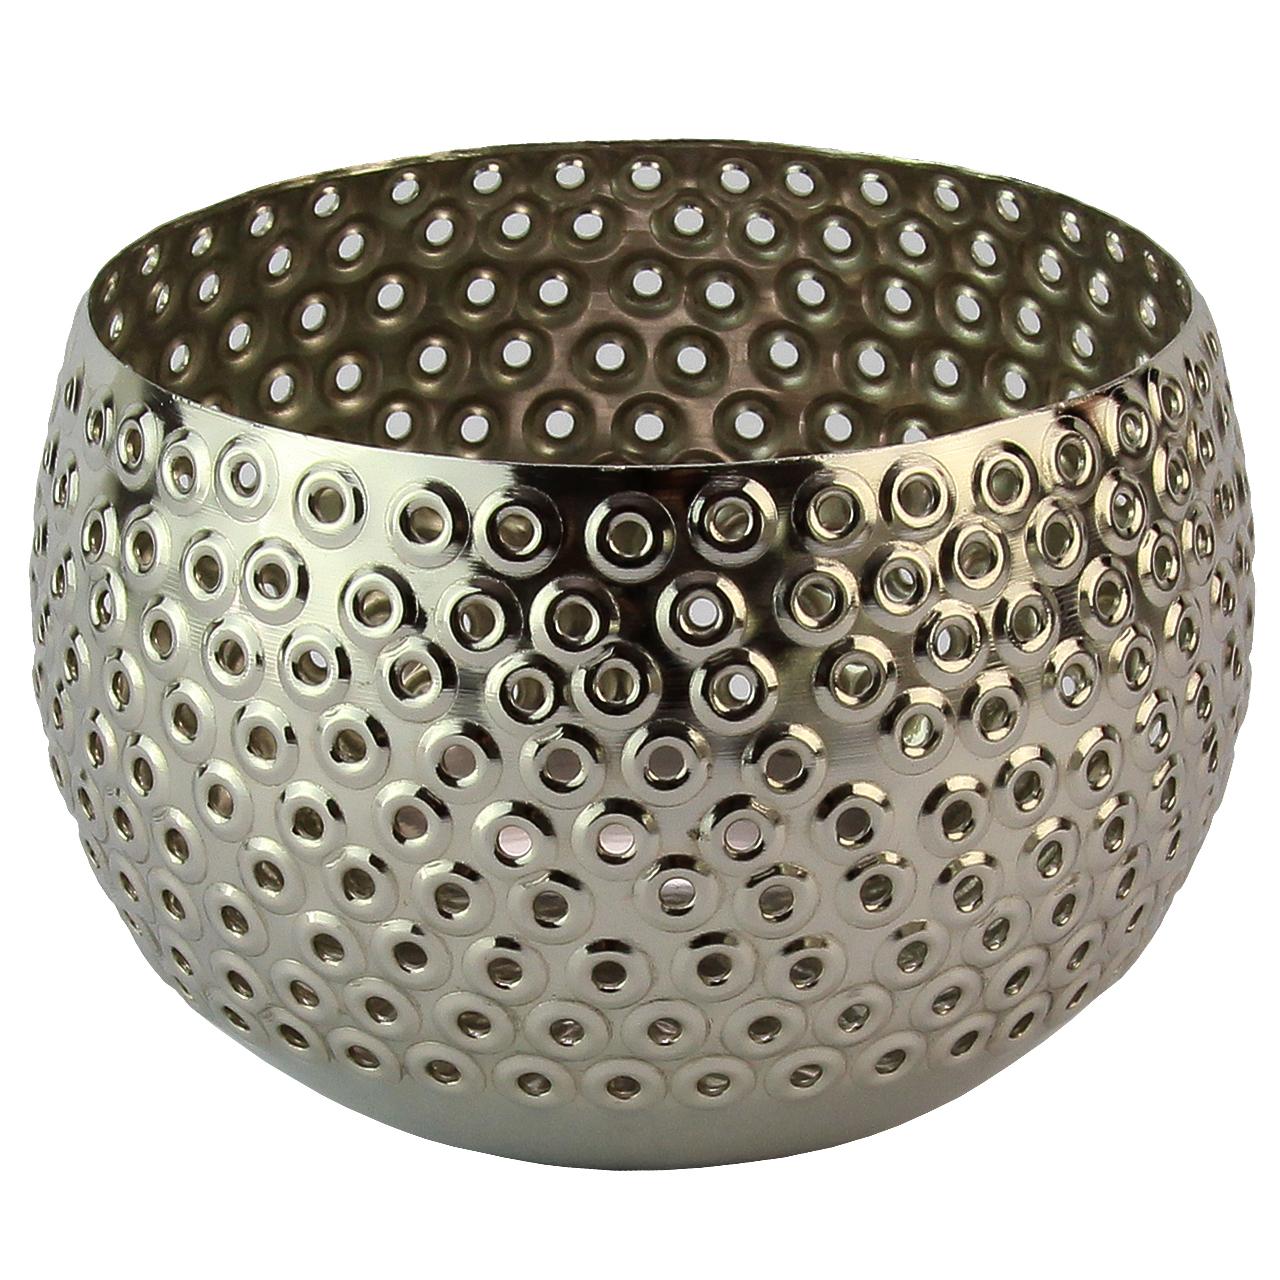 Bol Din Metal Argintiu 13 Cm